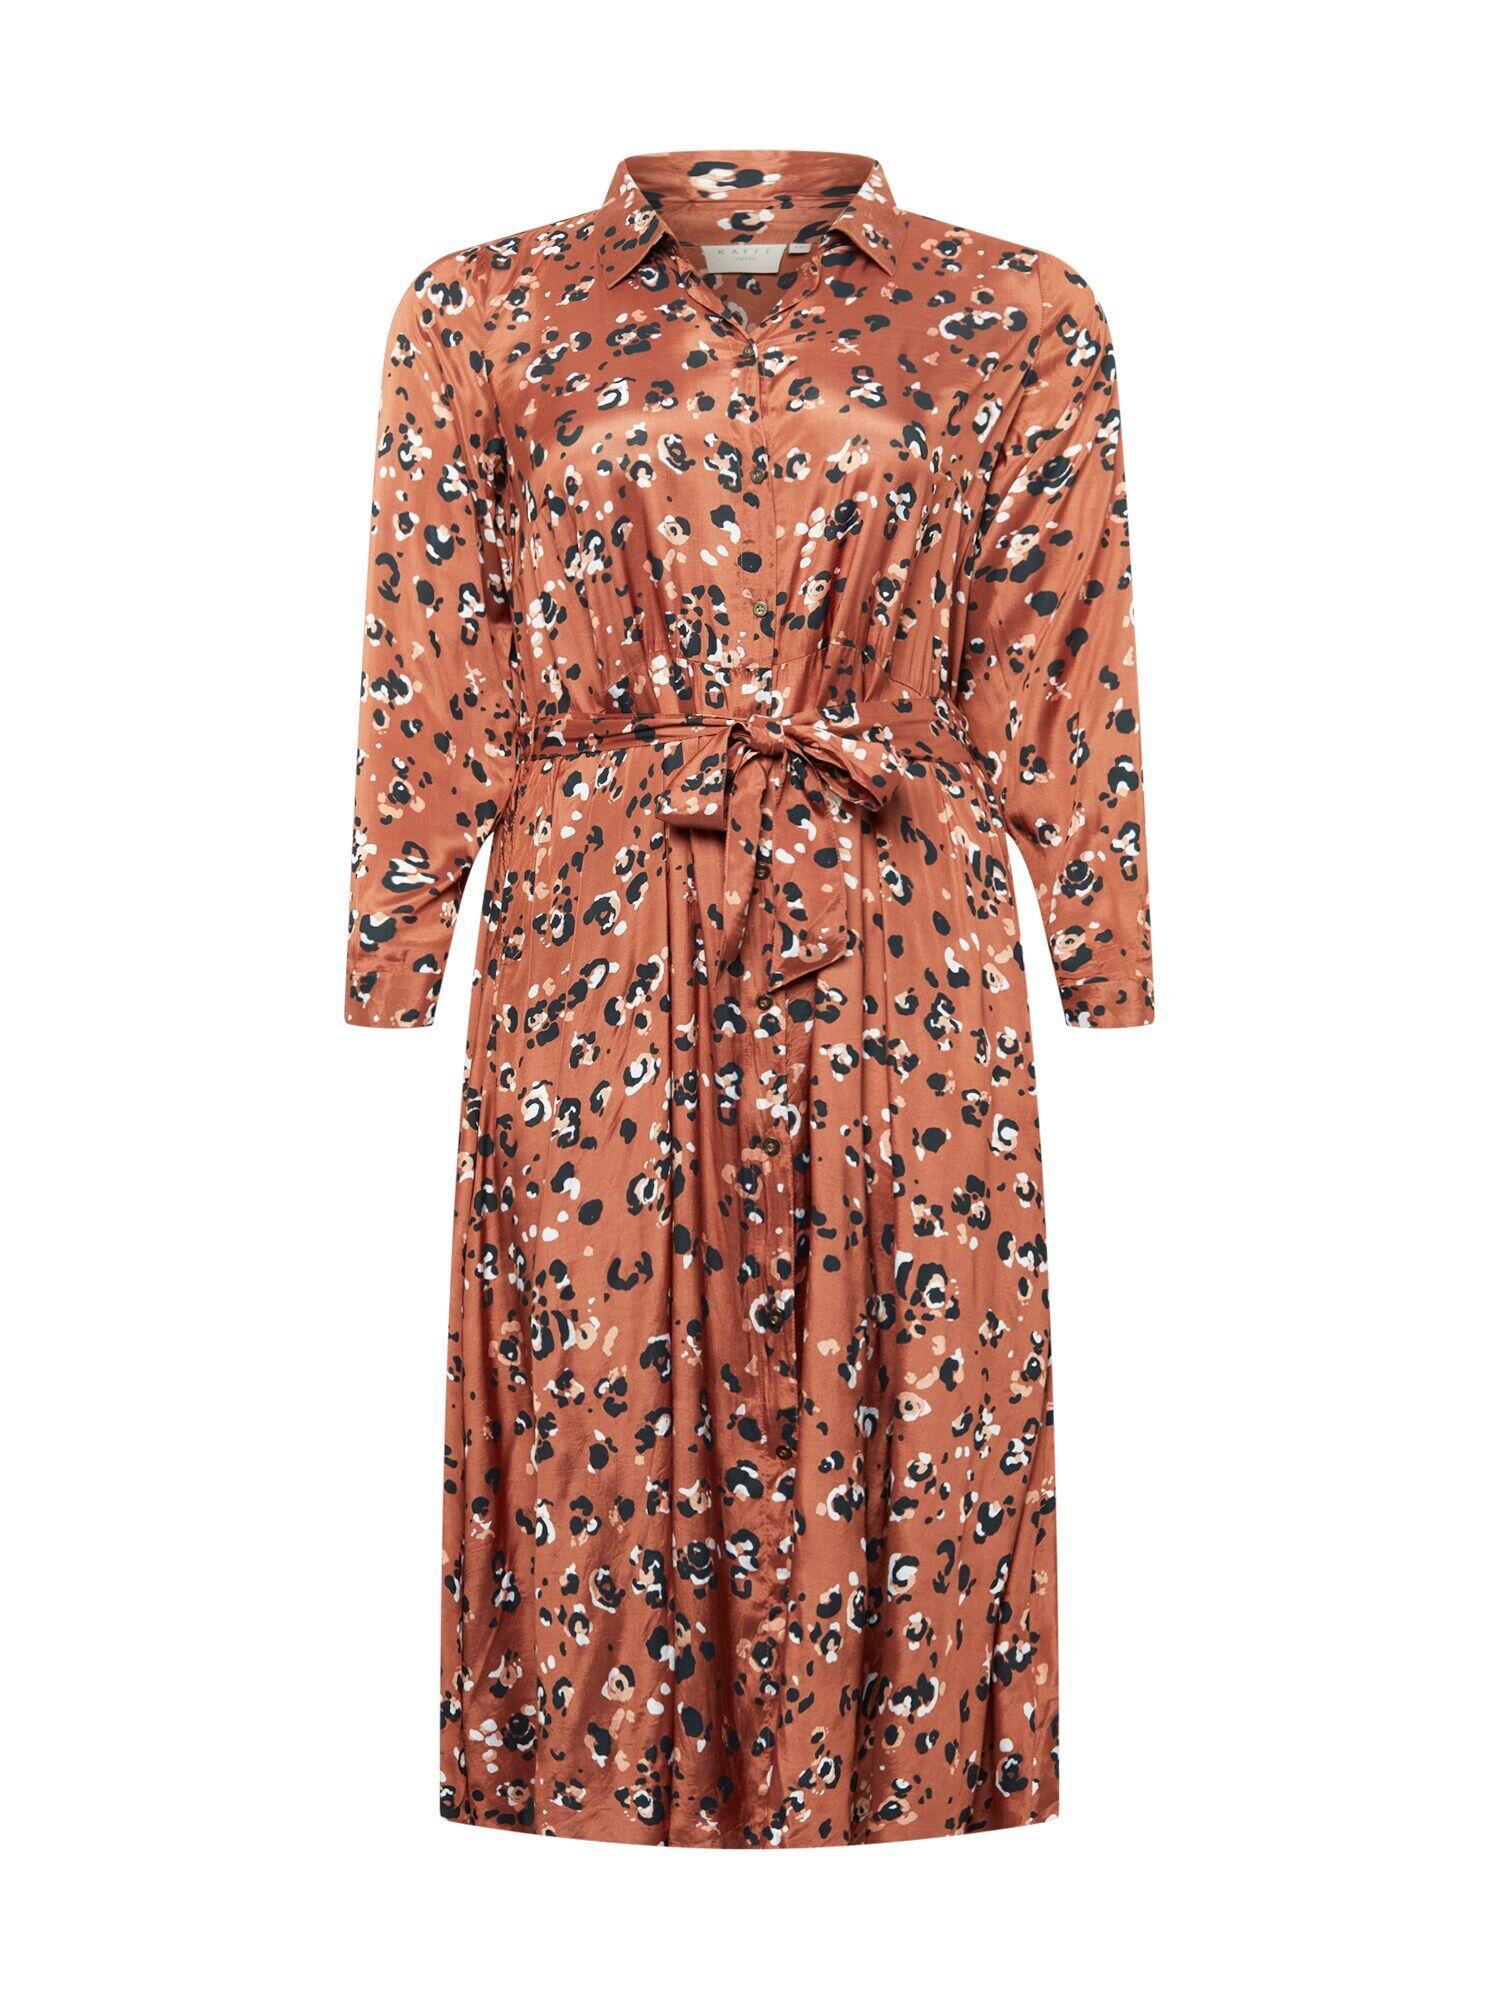 KAFFE CURVE Robe-chemise 'Miliany'  - Marron - Taille: 46 - female